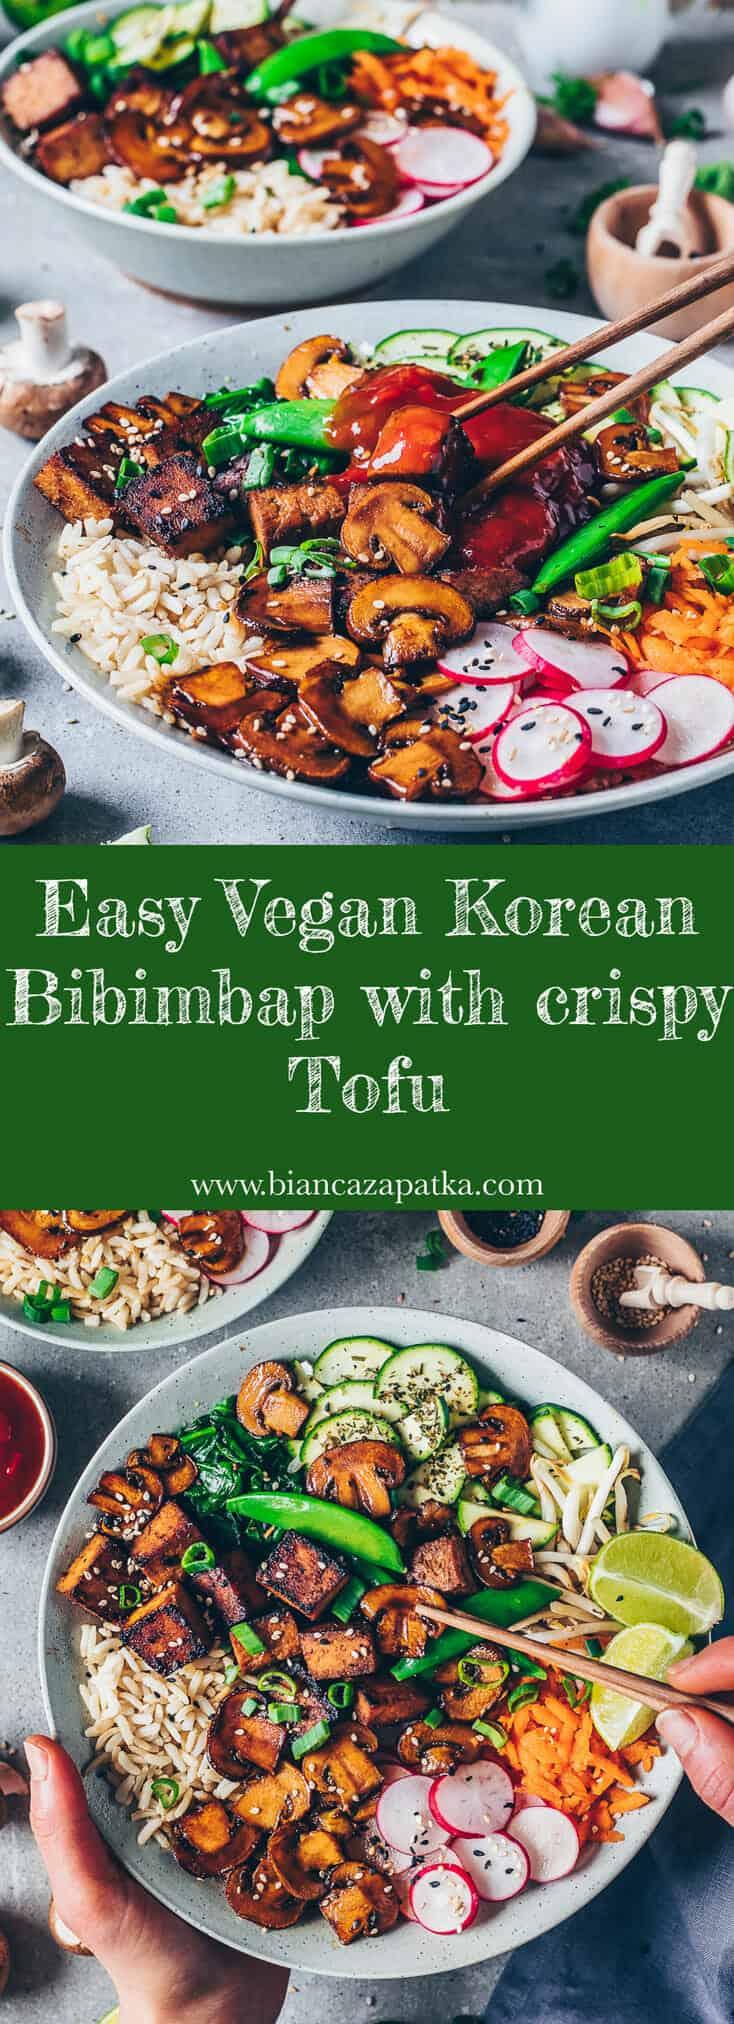 Vegan Bibimbap recipe. Korean mixed rice dish with vegetables and crispy tofu. Easy to make, healthy, delicious. Asian food.